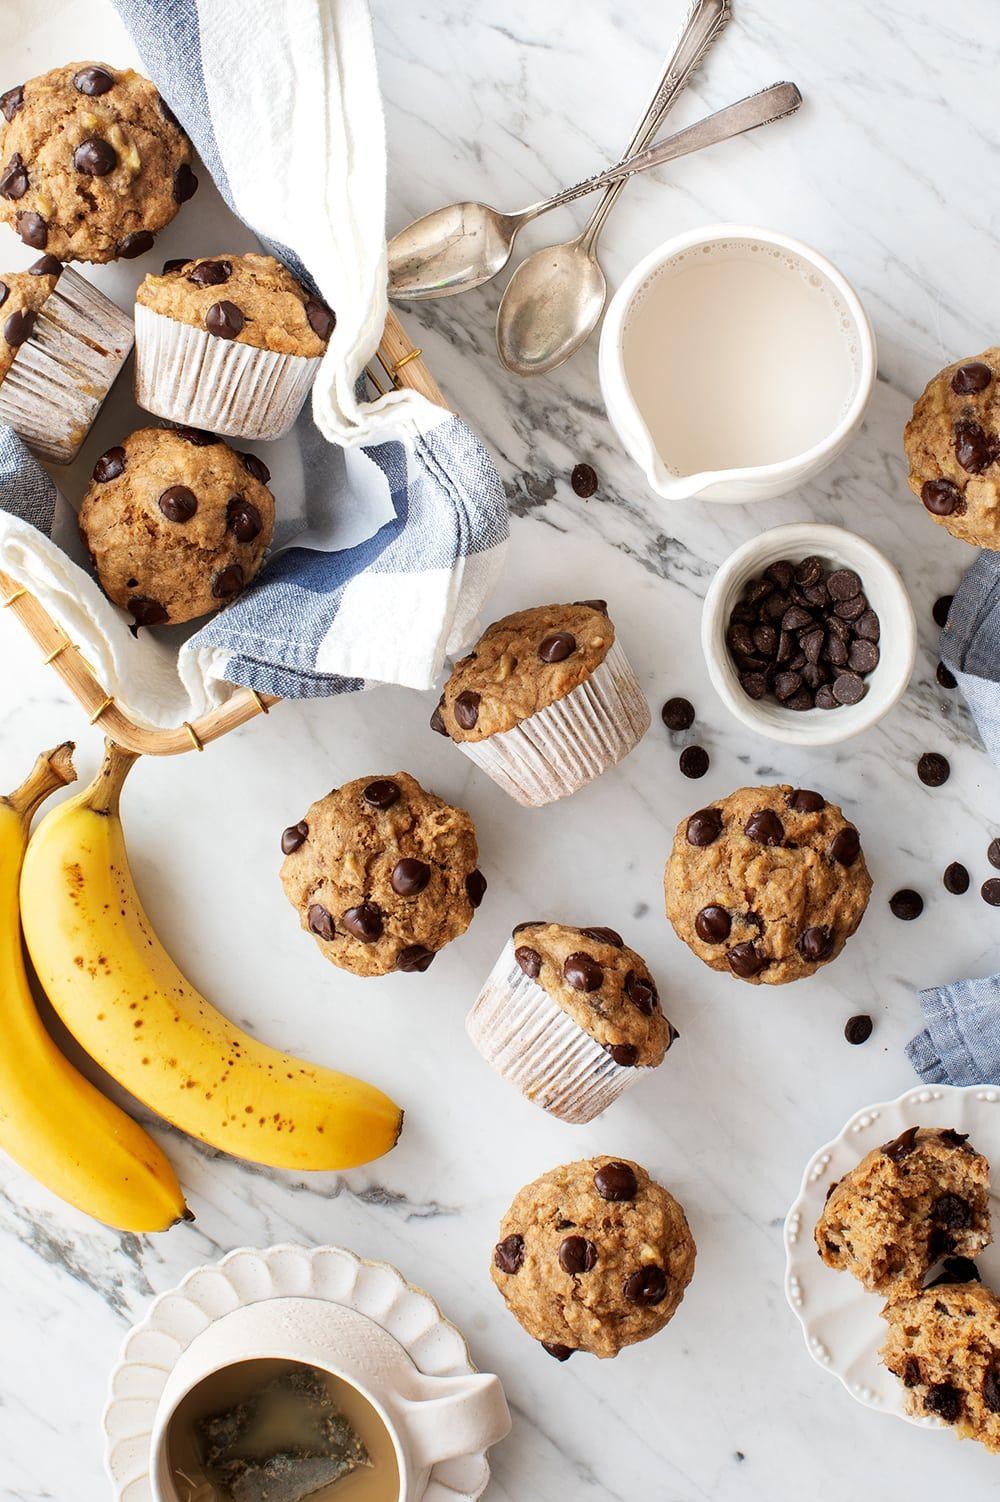 vegan camping food recipes muffins